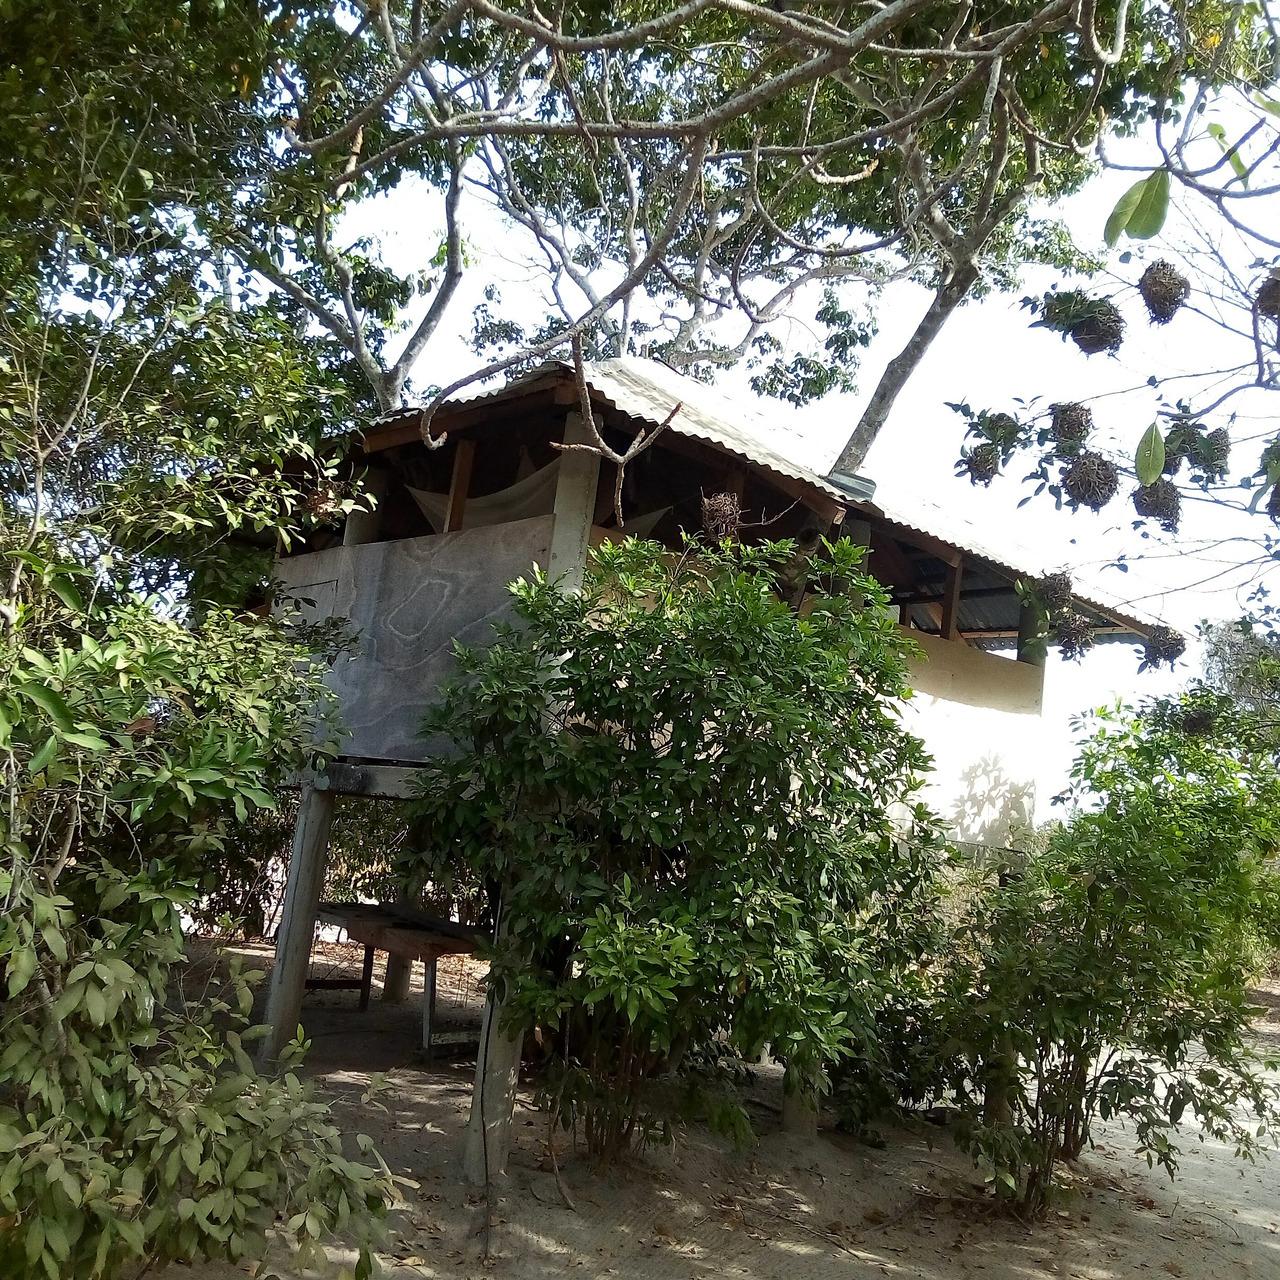 Ziguinchor Region Seyahati, 2020 - Tripadvisor avec Paillote Jardin